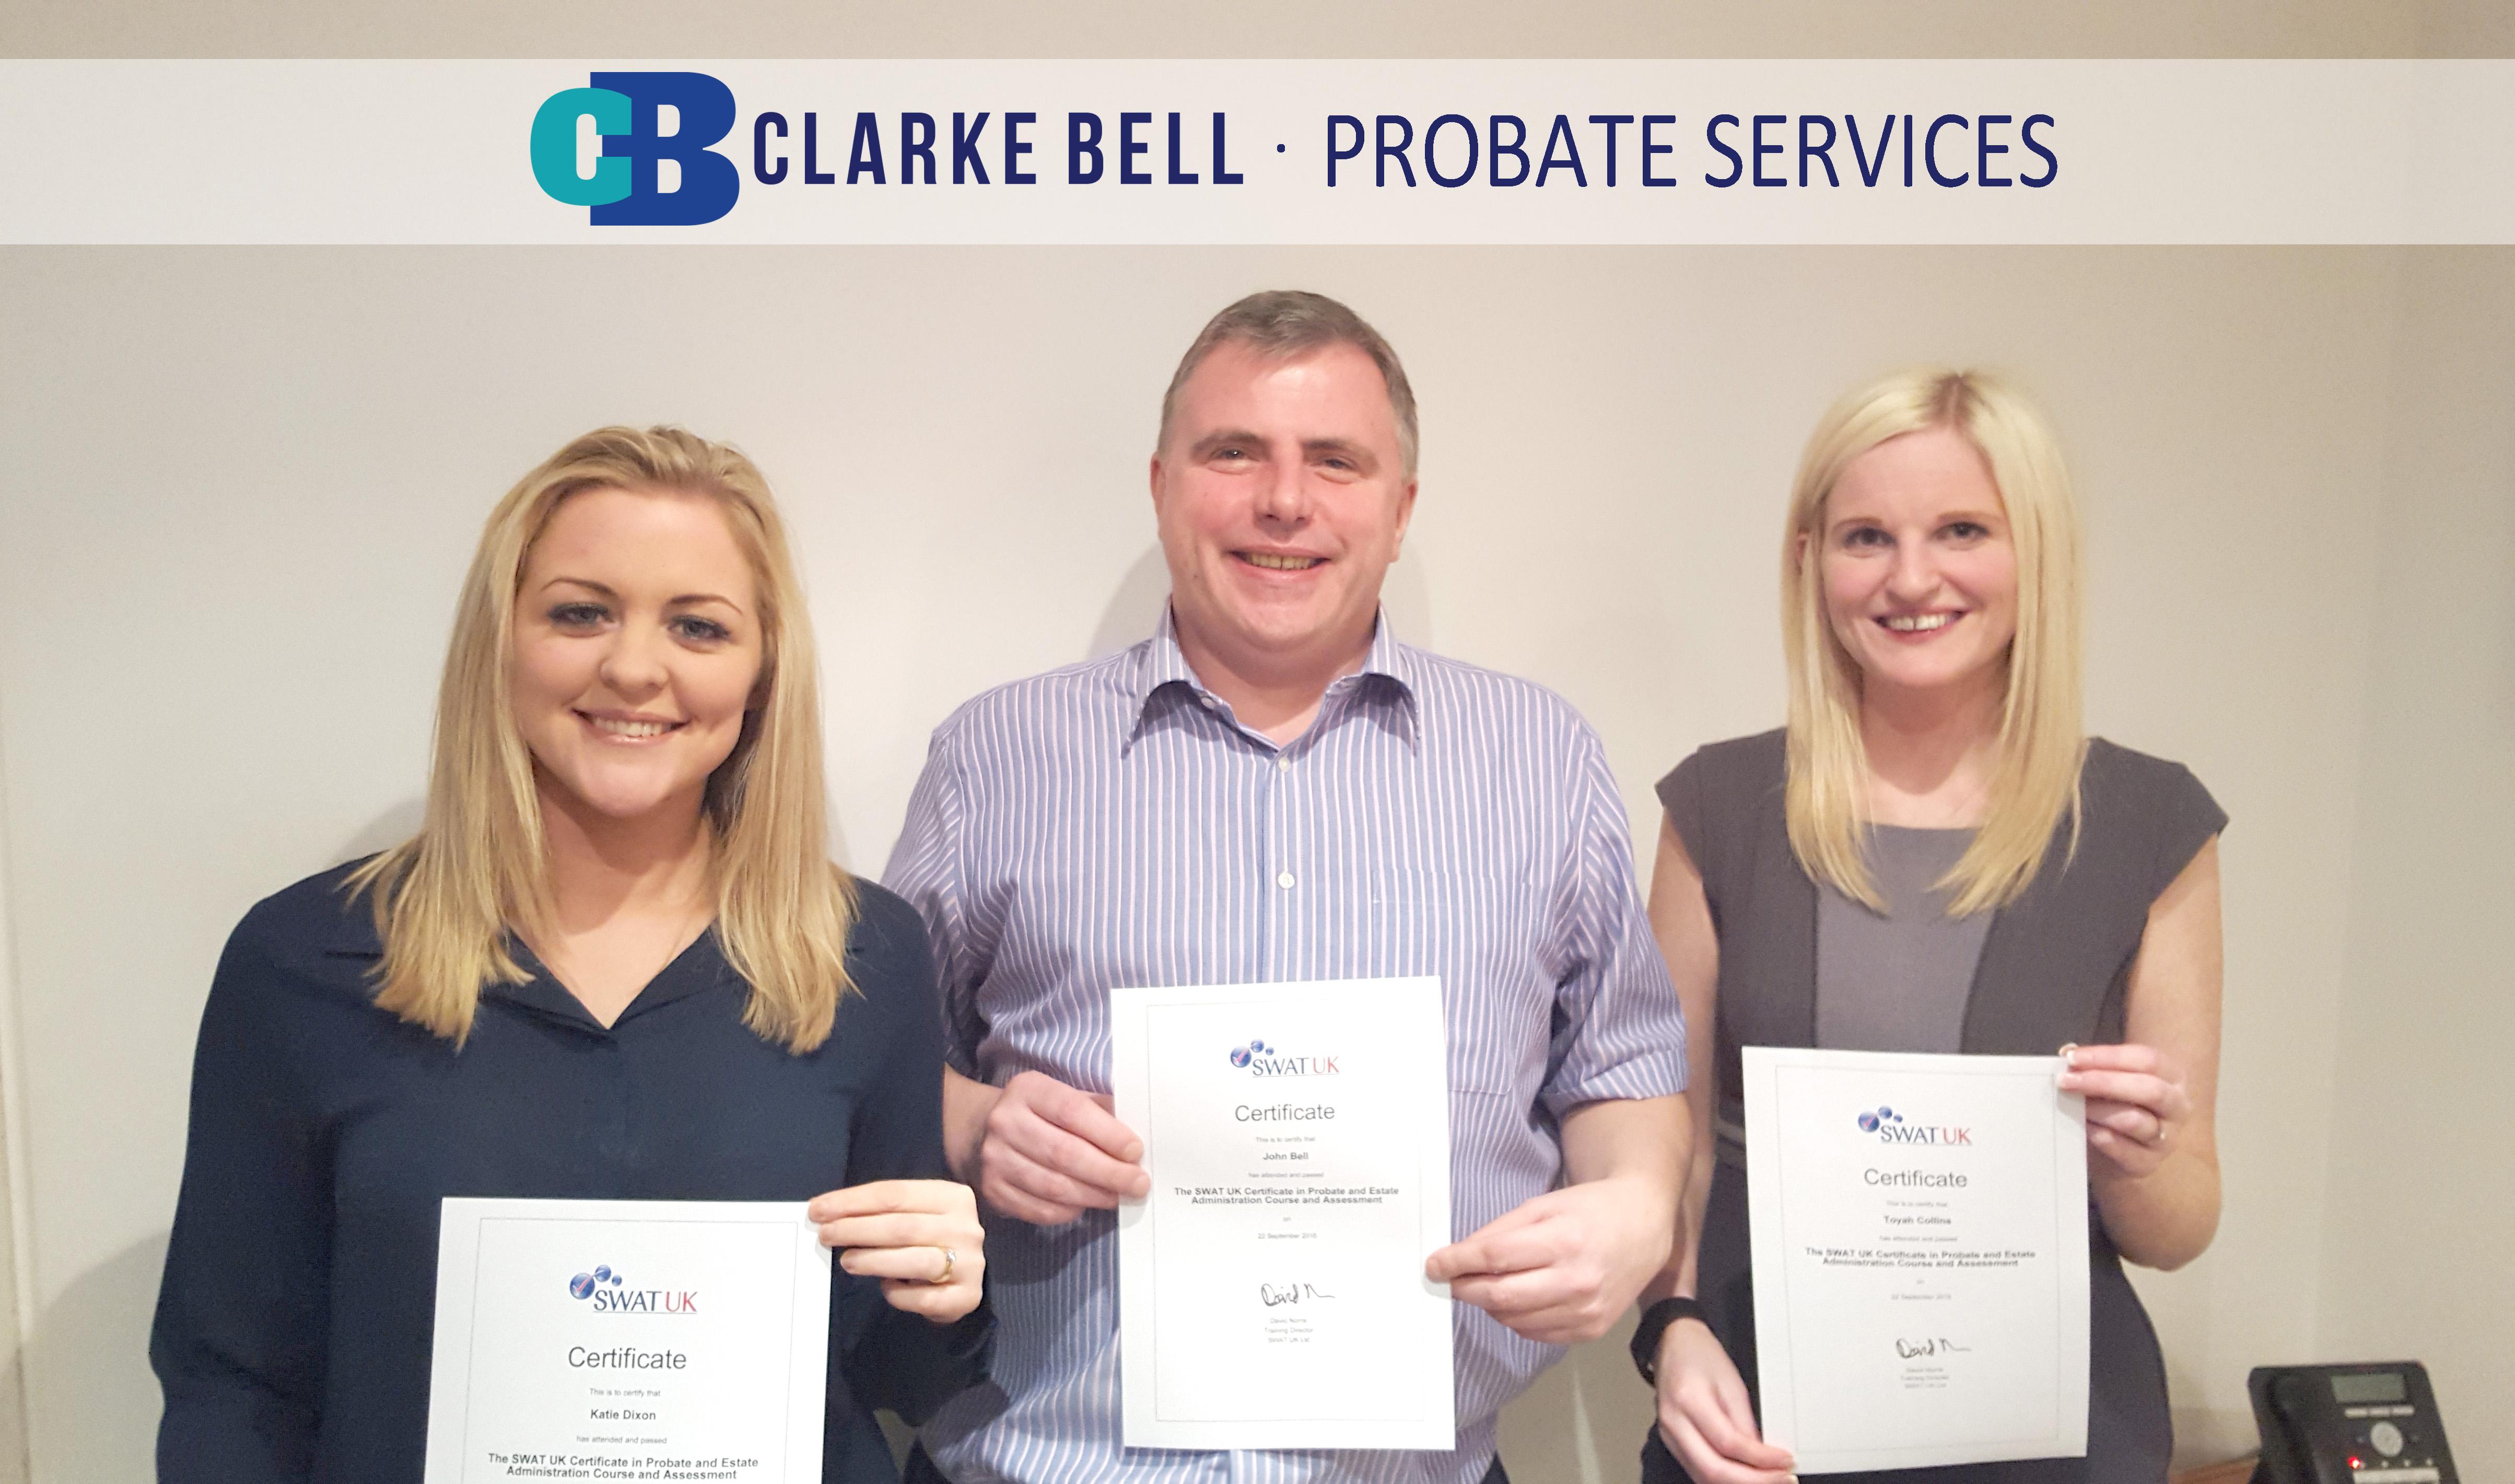 clarke bell probate service